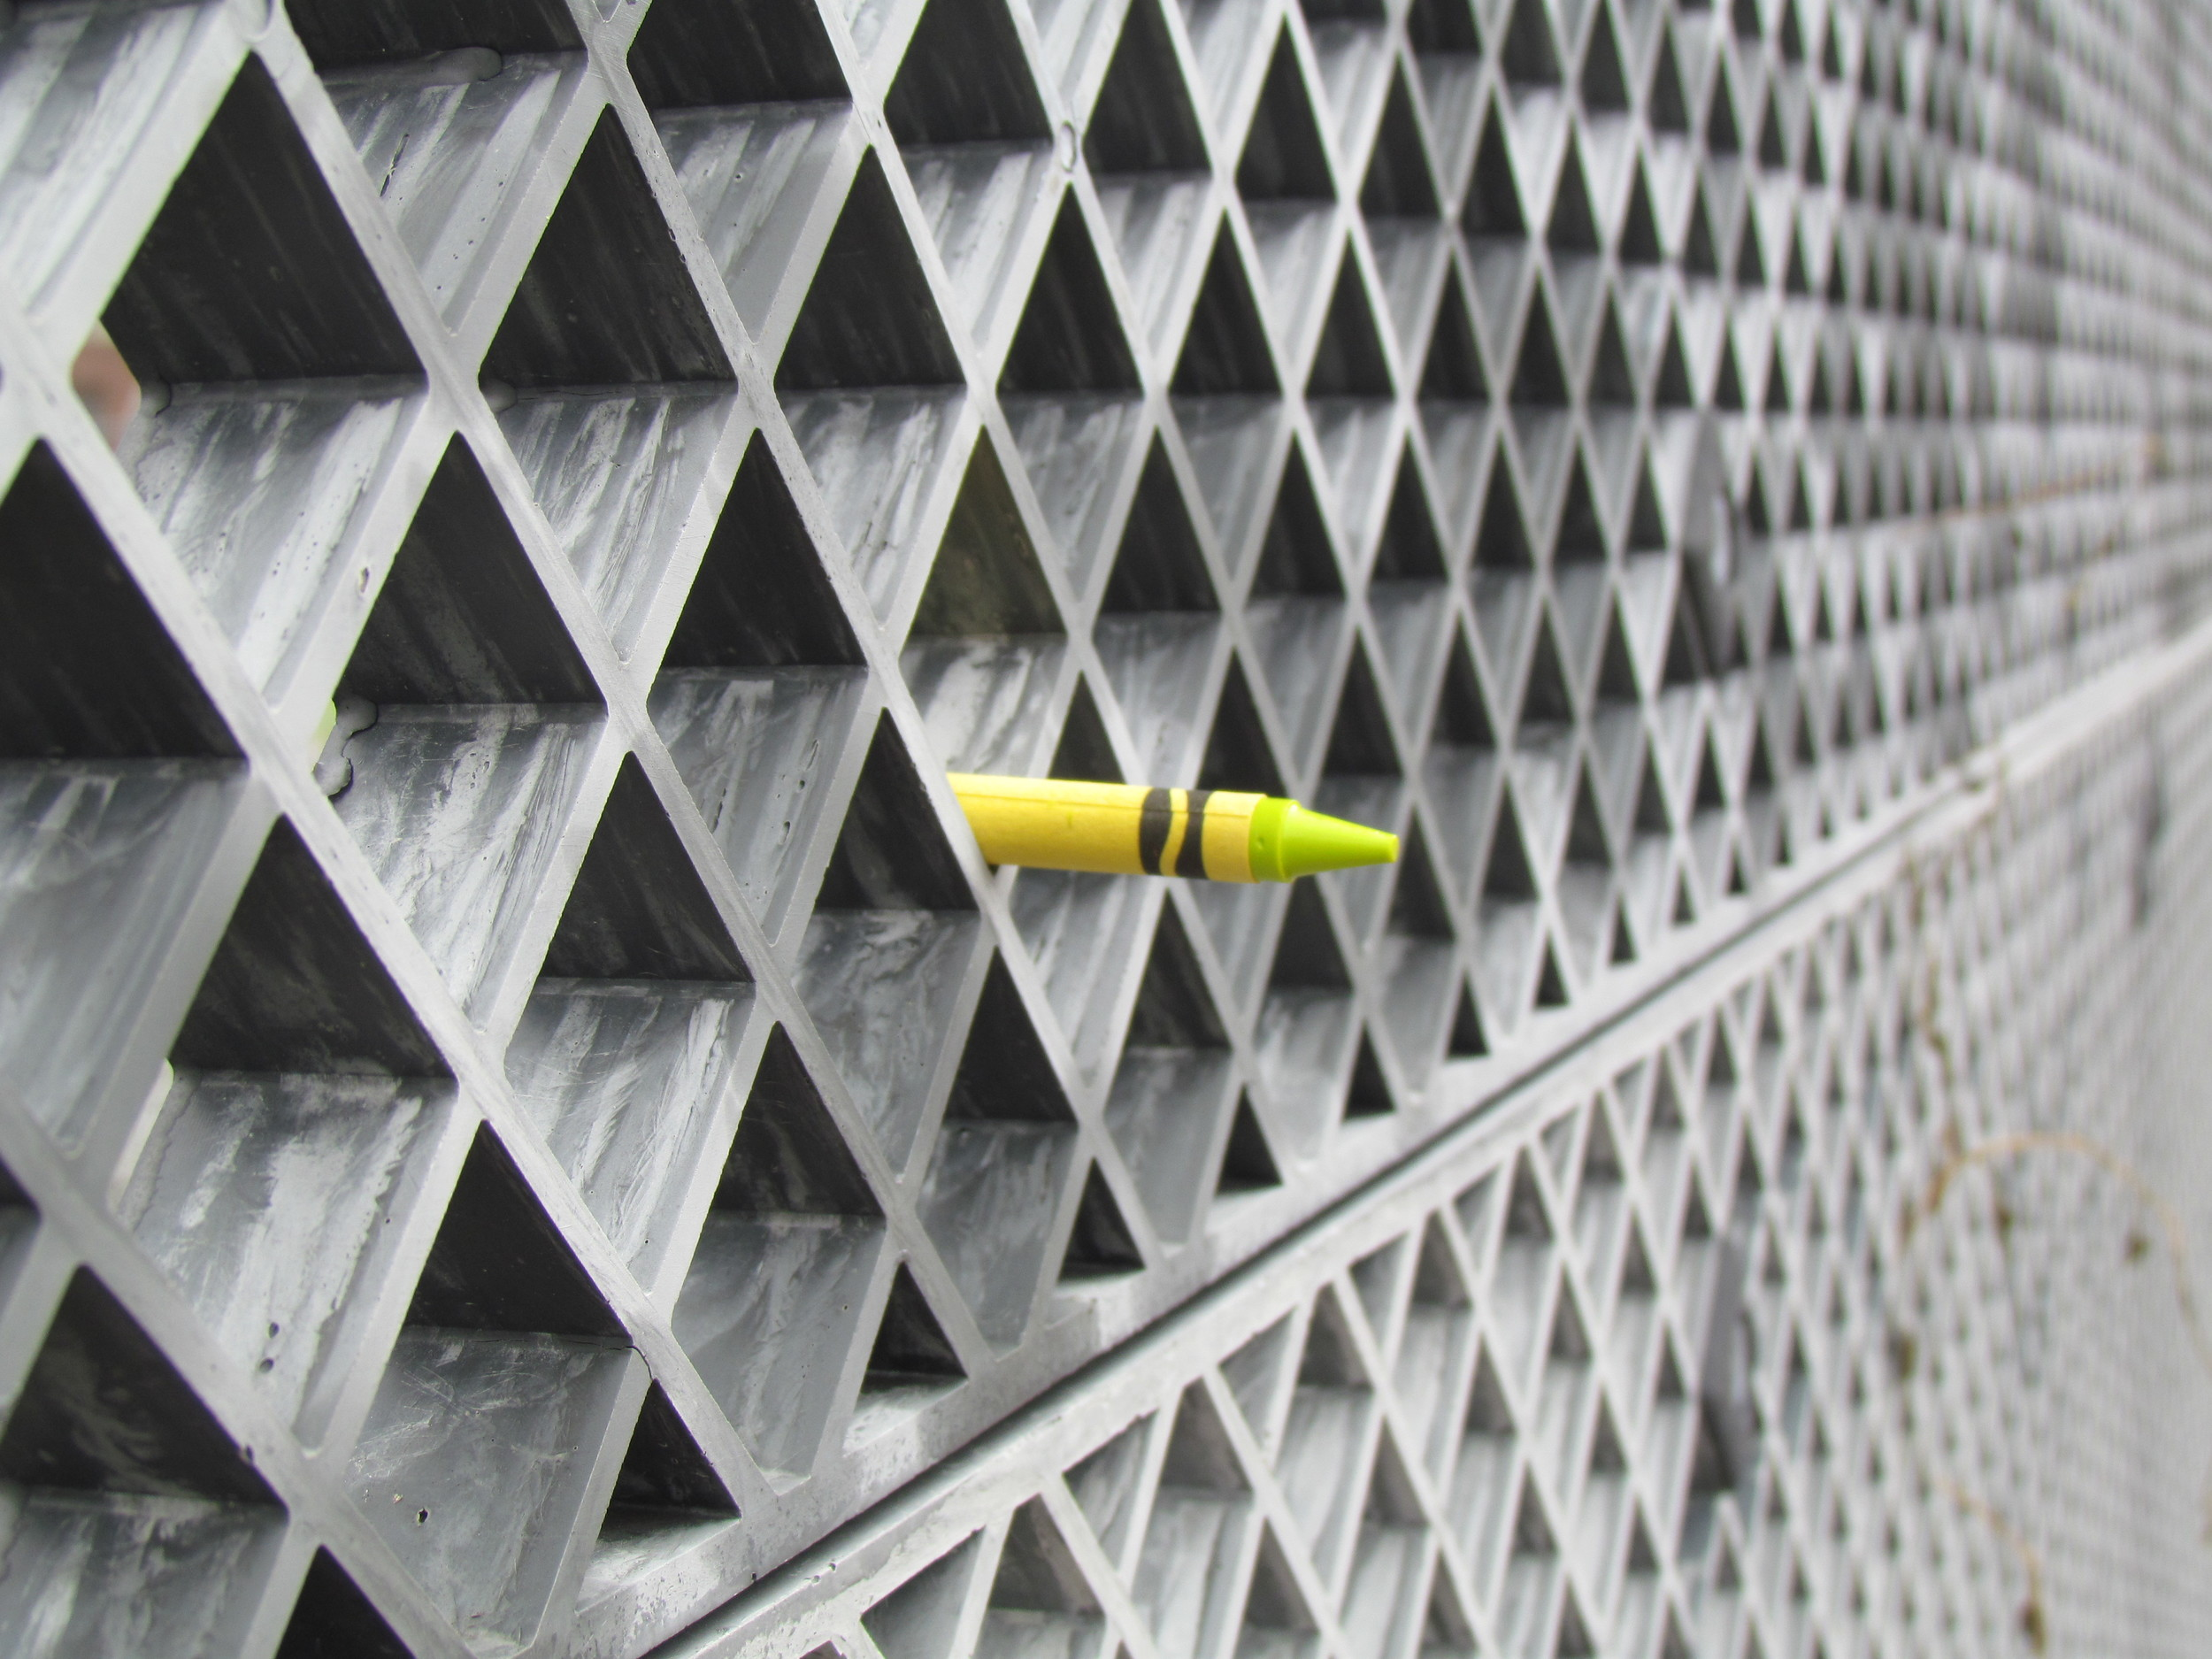 Crayon Intervention, 2011, Savannah, GA